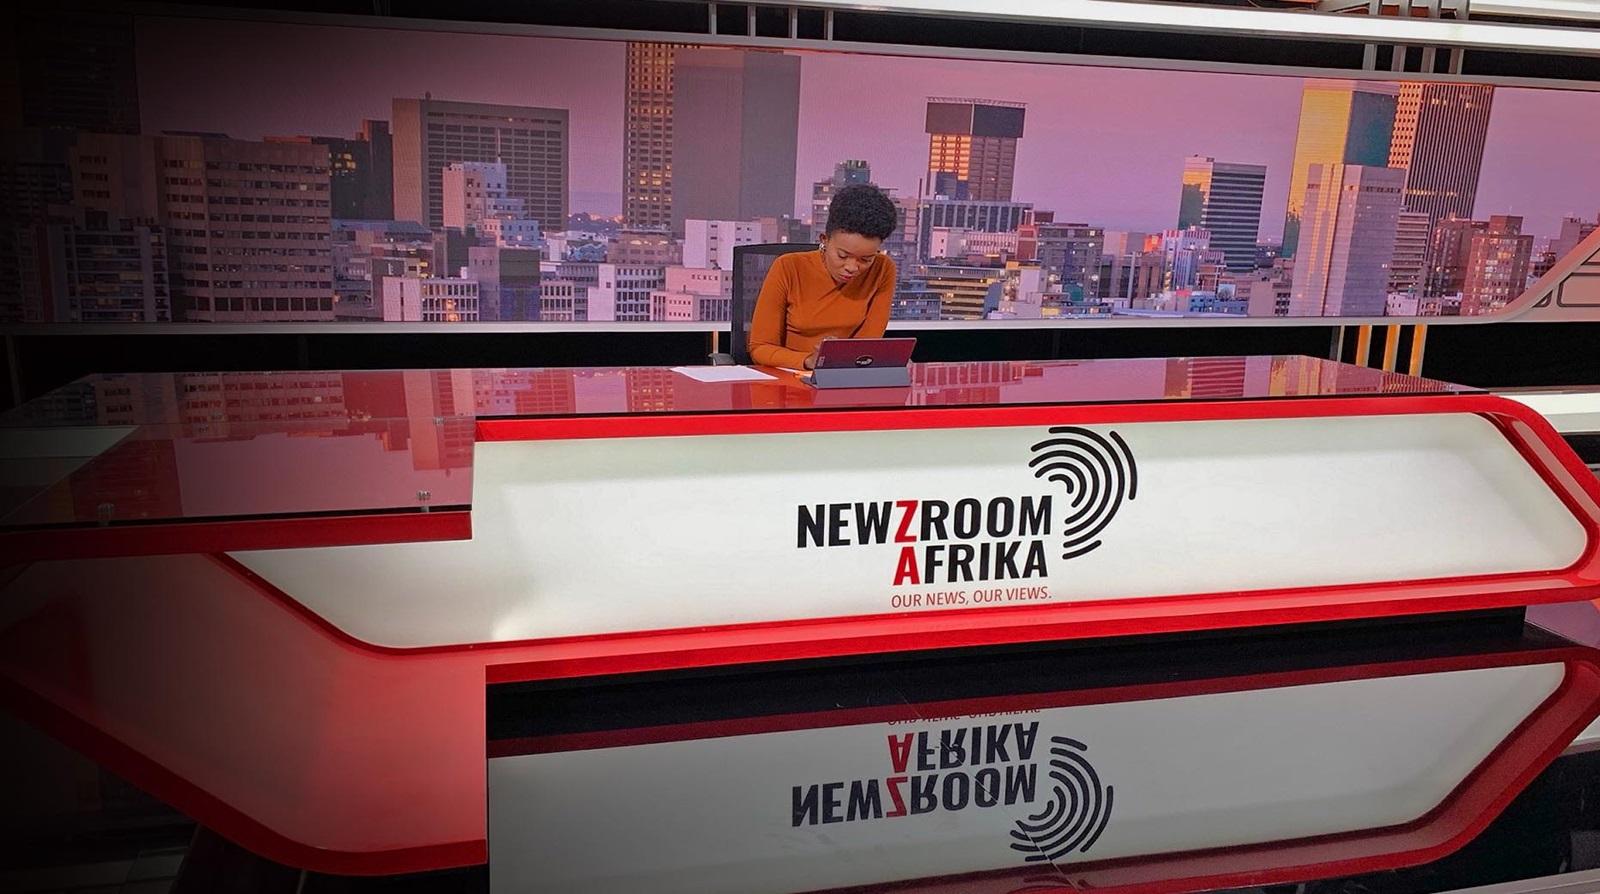 Newzroom Afrika anchor desk